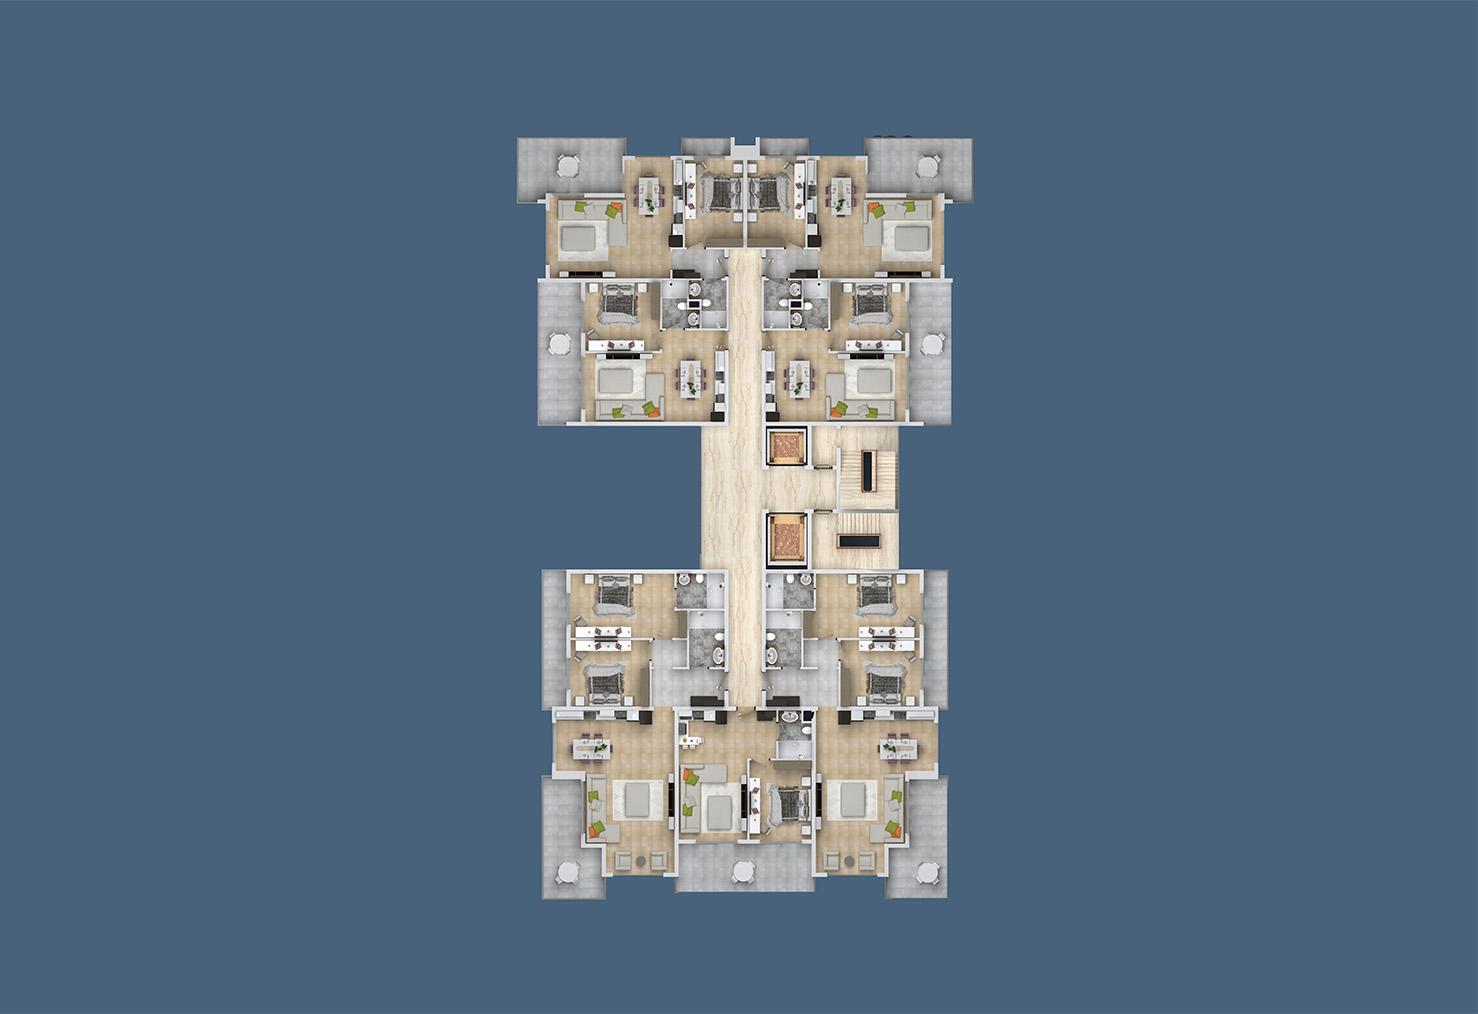 Floor plans of apartments 5 floor «C» Yekta Kingdom Trade Center